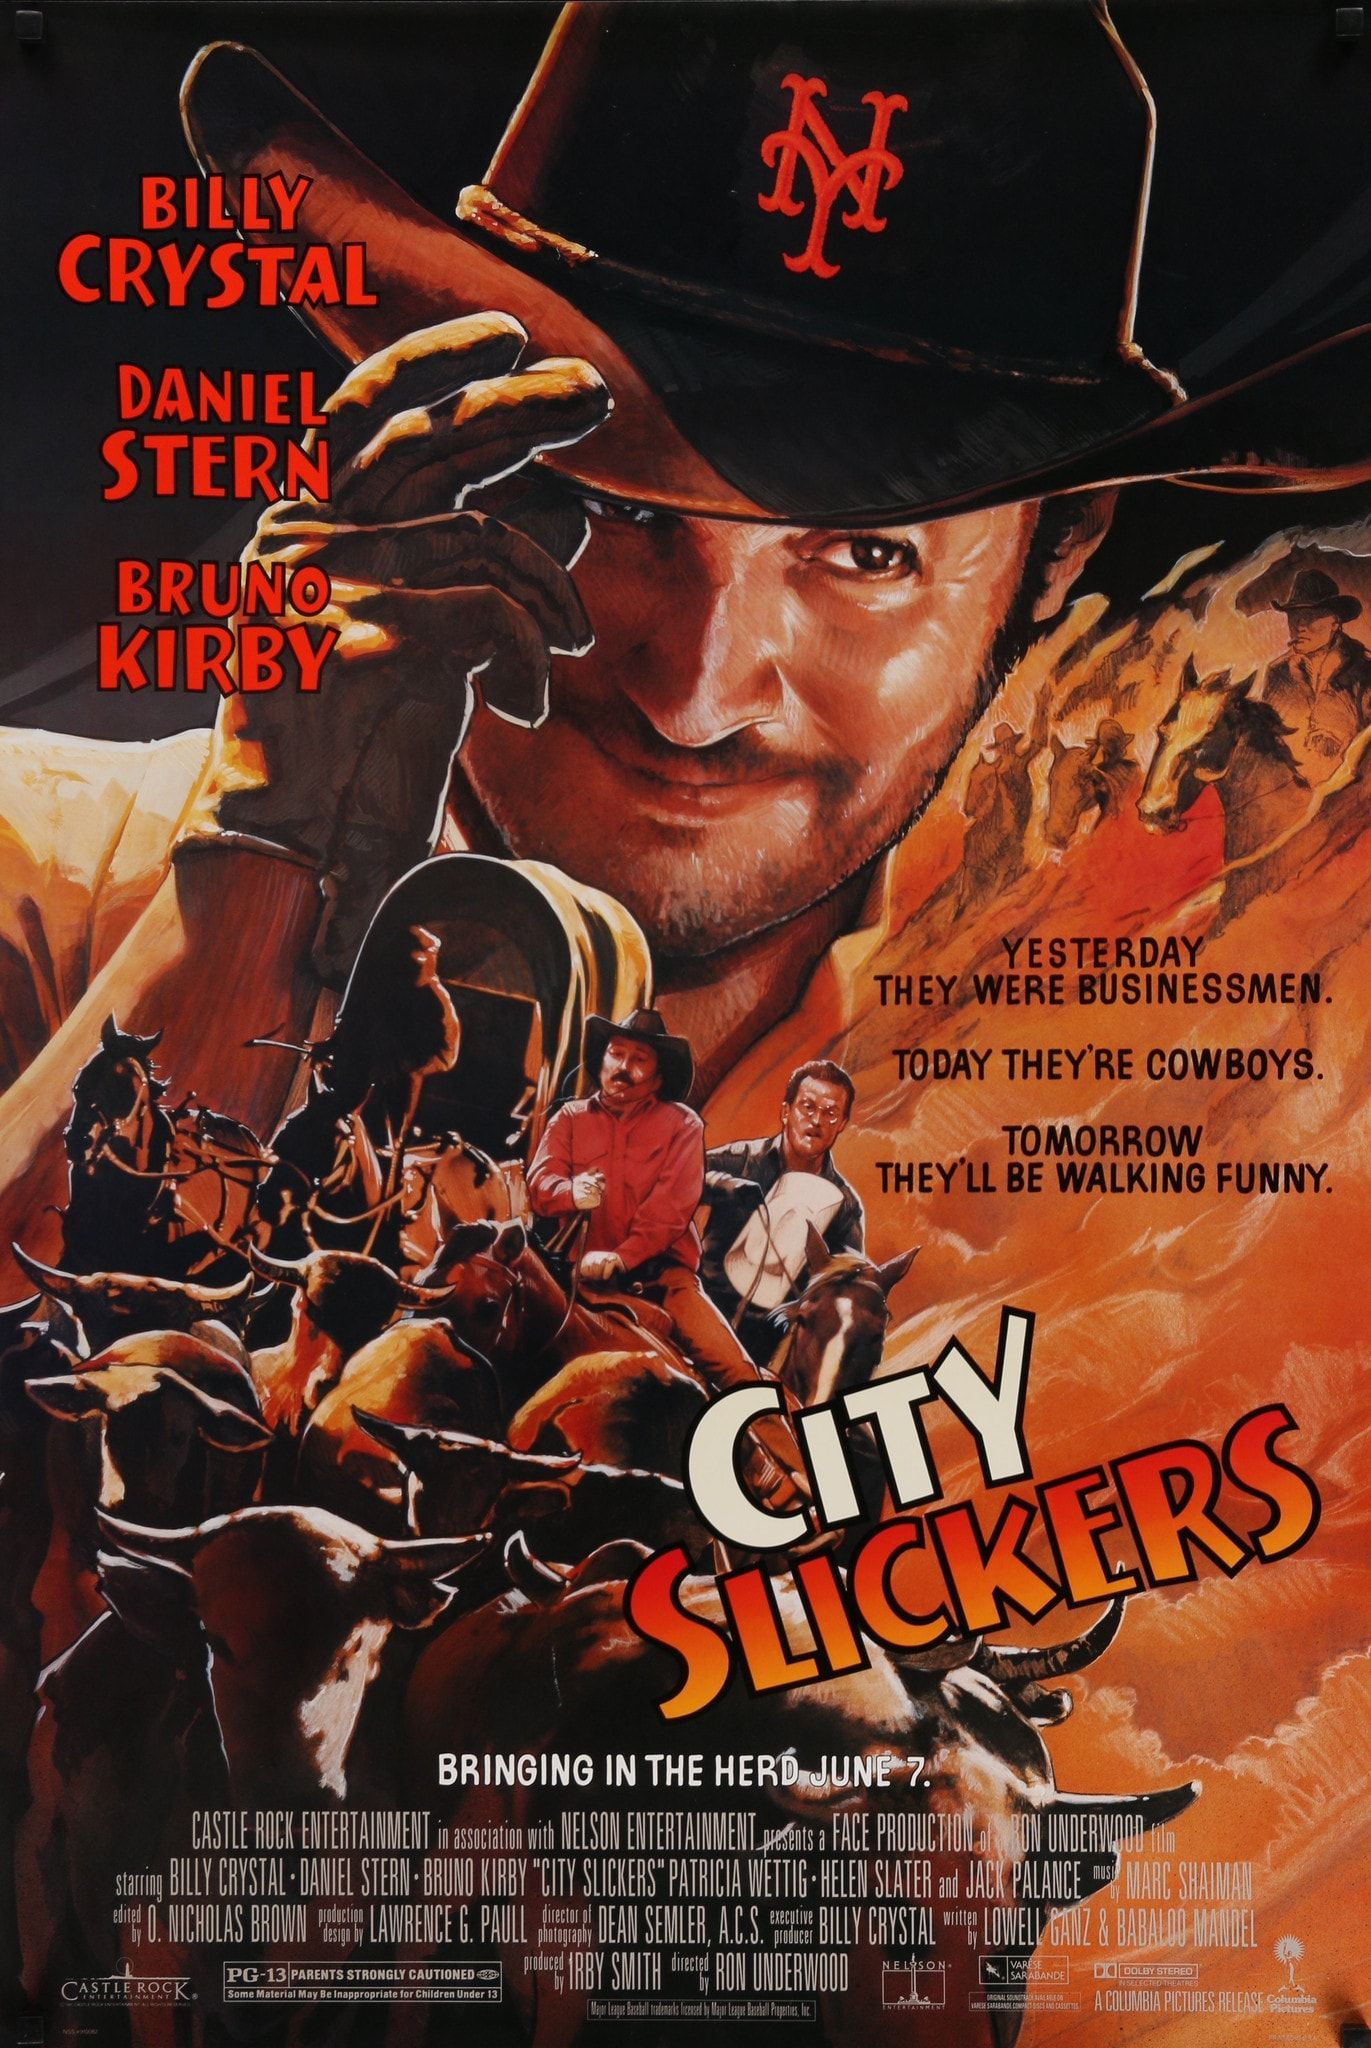 City Slickers 1991 City Slickers Original Movie Posters Movie Posters